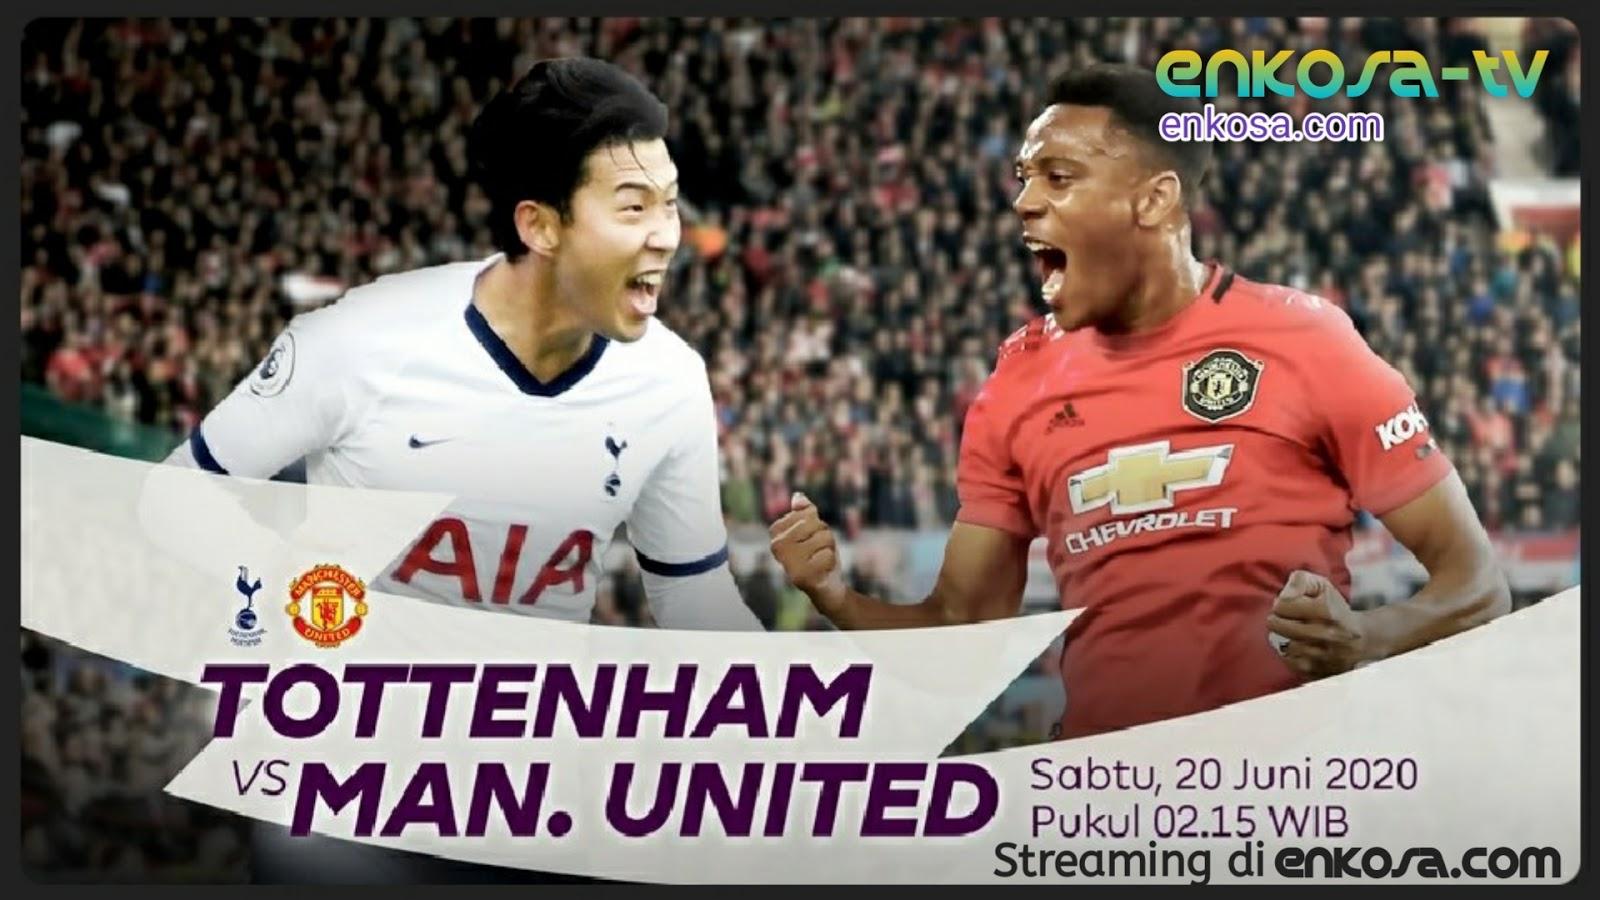 Prediksi dan Jadwal Tanding Manchester United vs Tottenham Hotspur